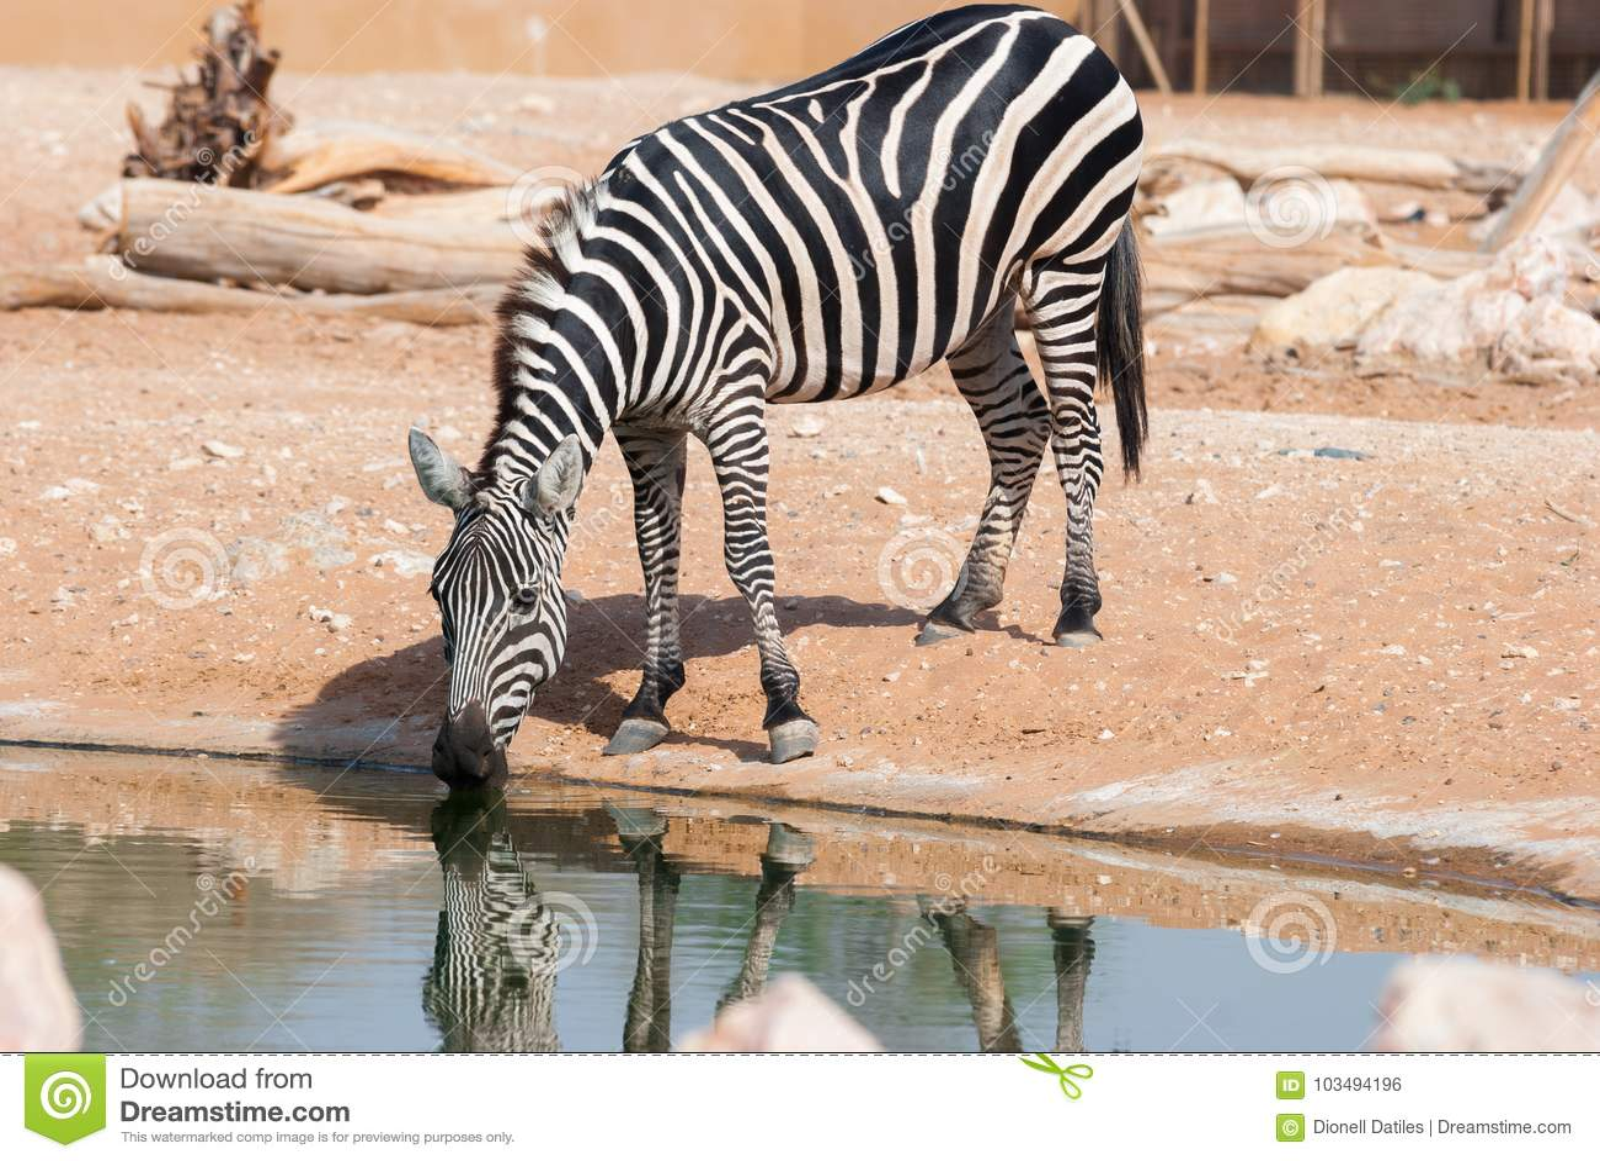 Zebra drinking in a pond